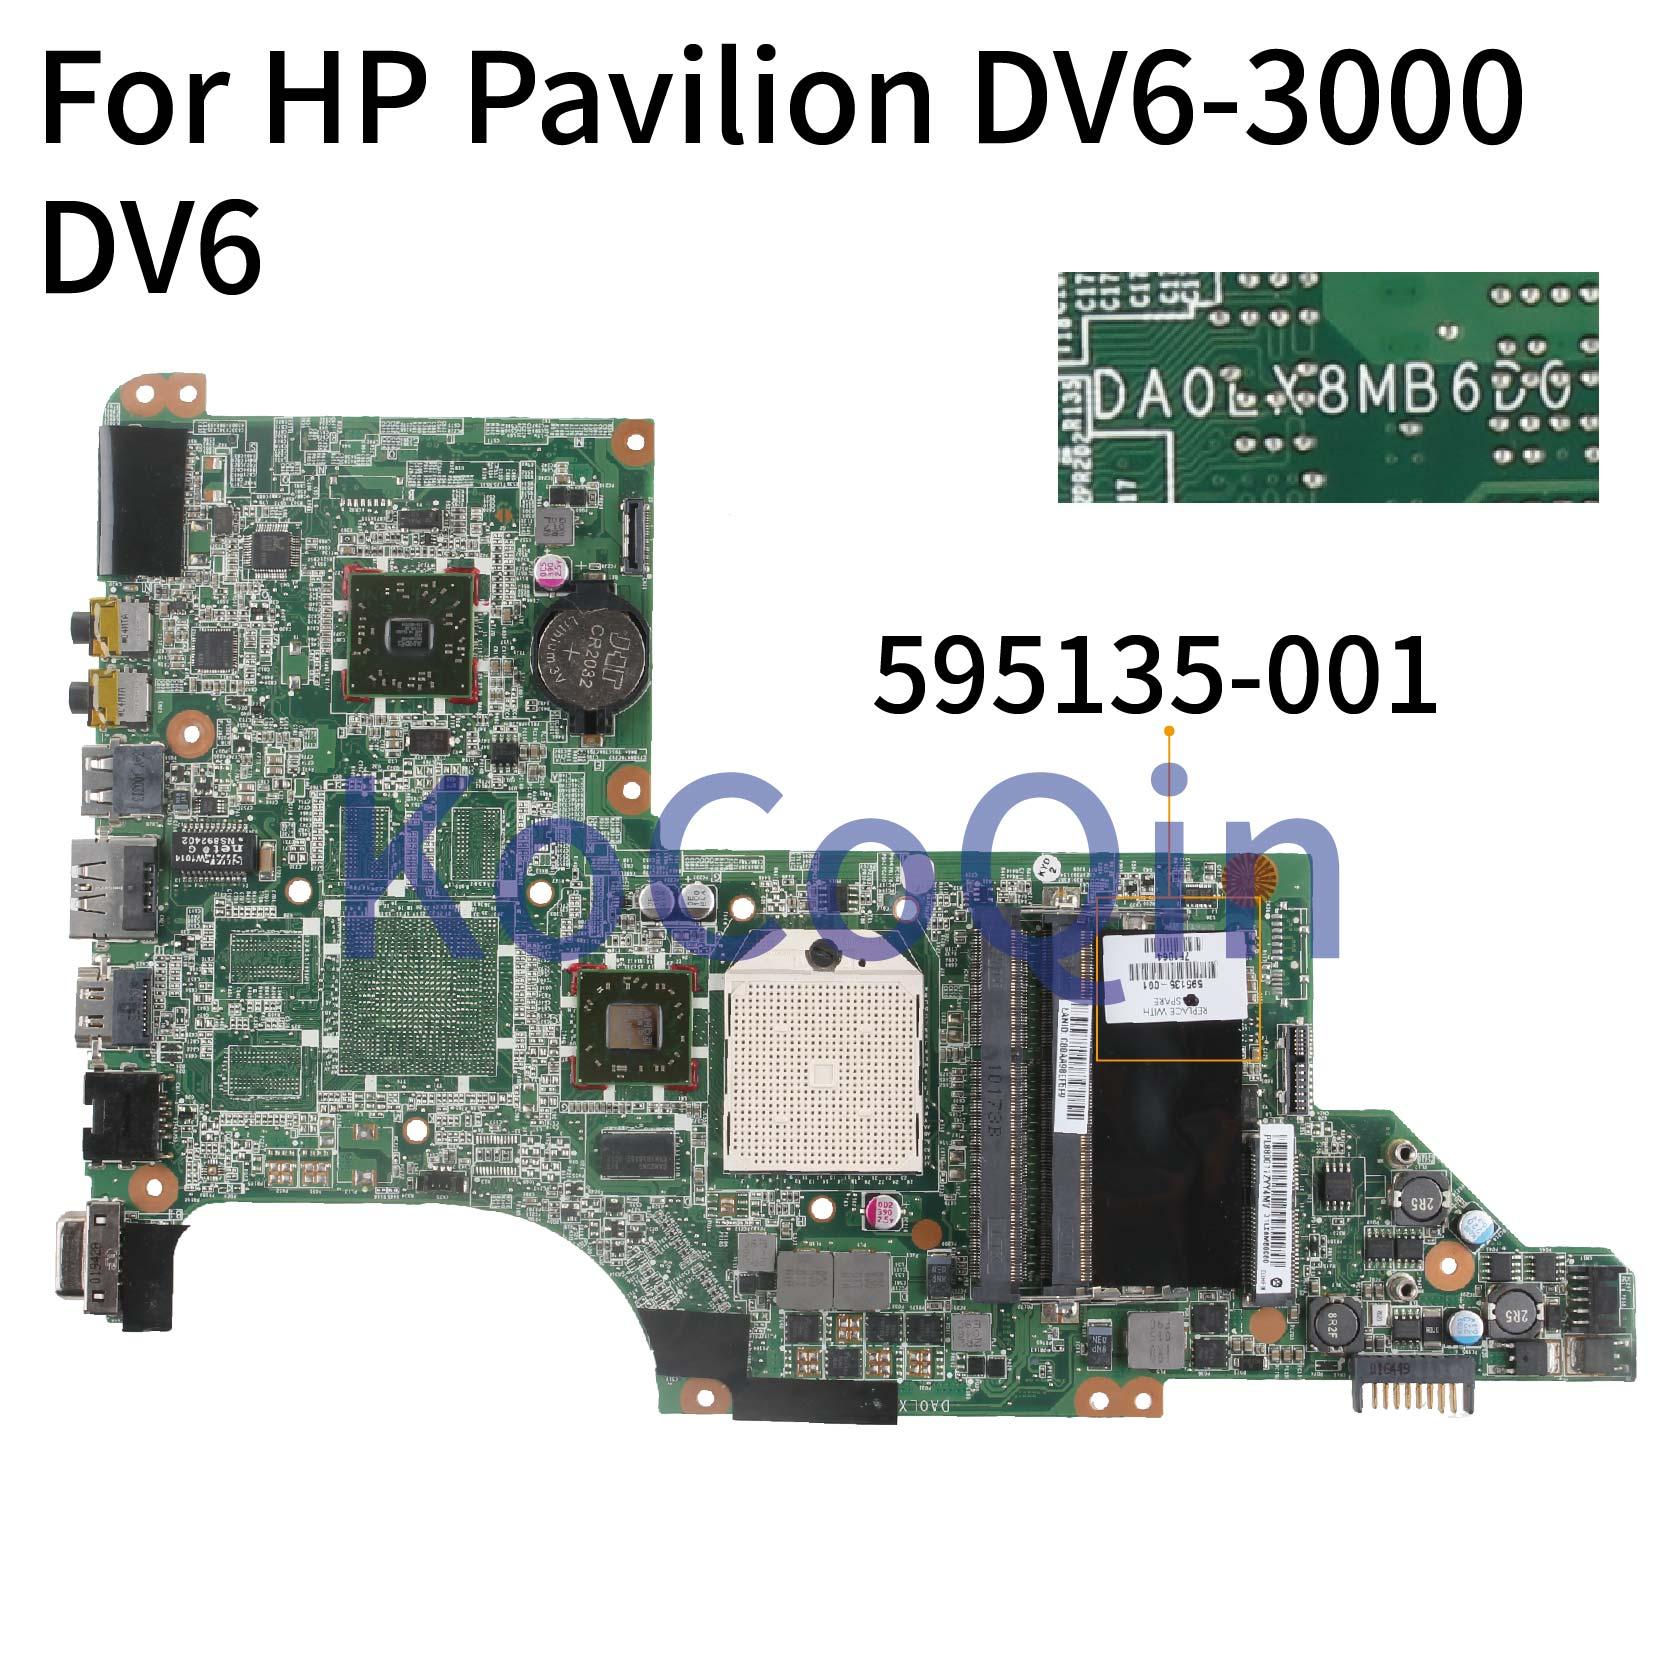 KoCoQin Laptop Motherboard For HP Pavilion DV6-3000 DV6 Mainboard 595135-001 595135-501 DAOLX8MB6D1